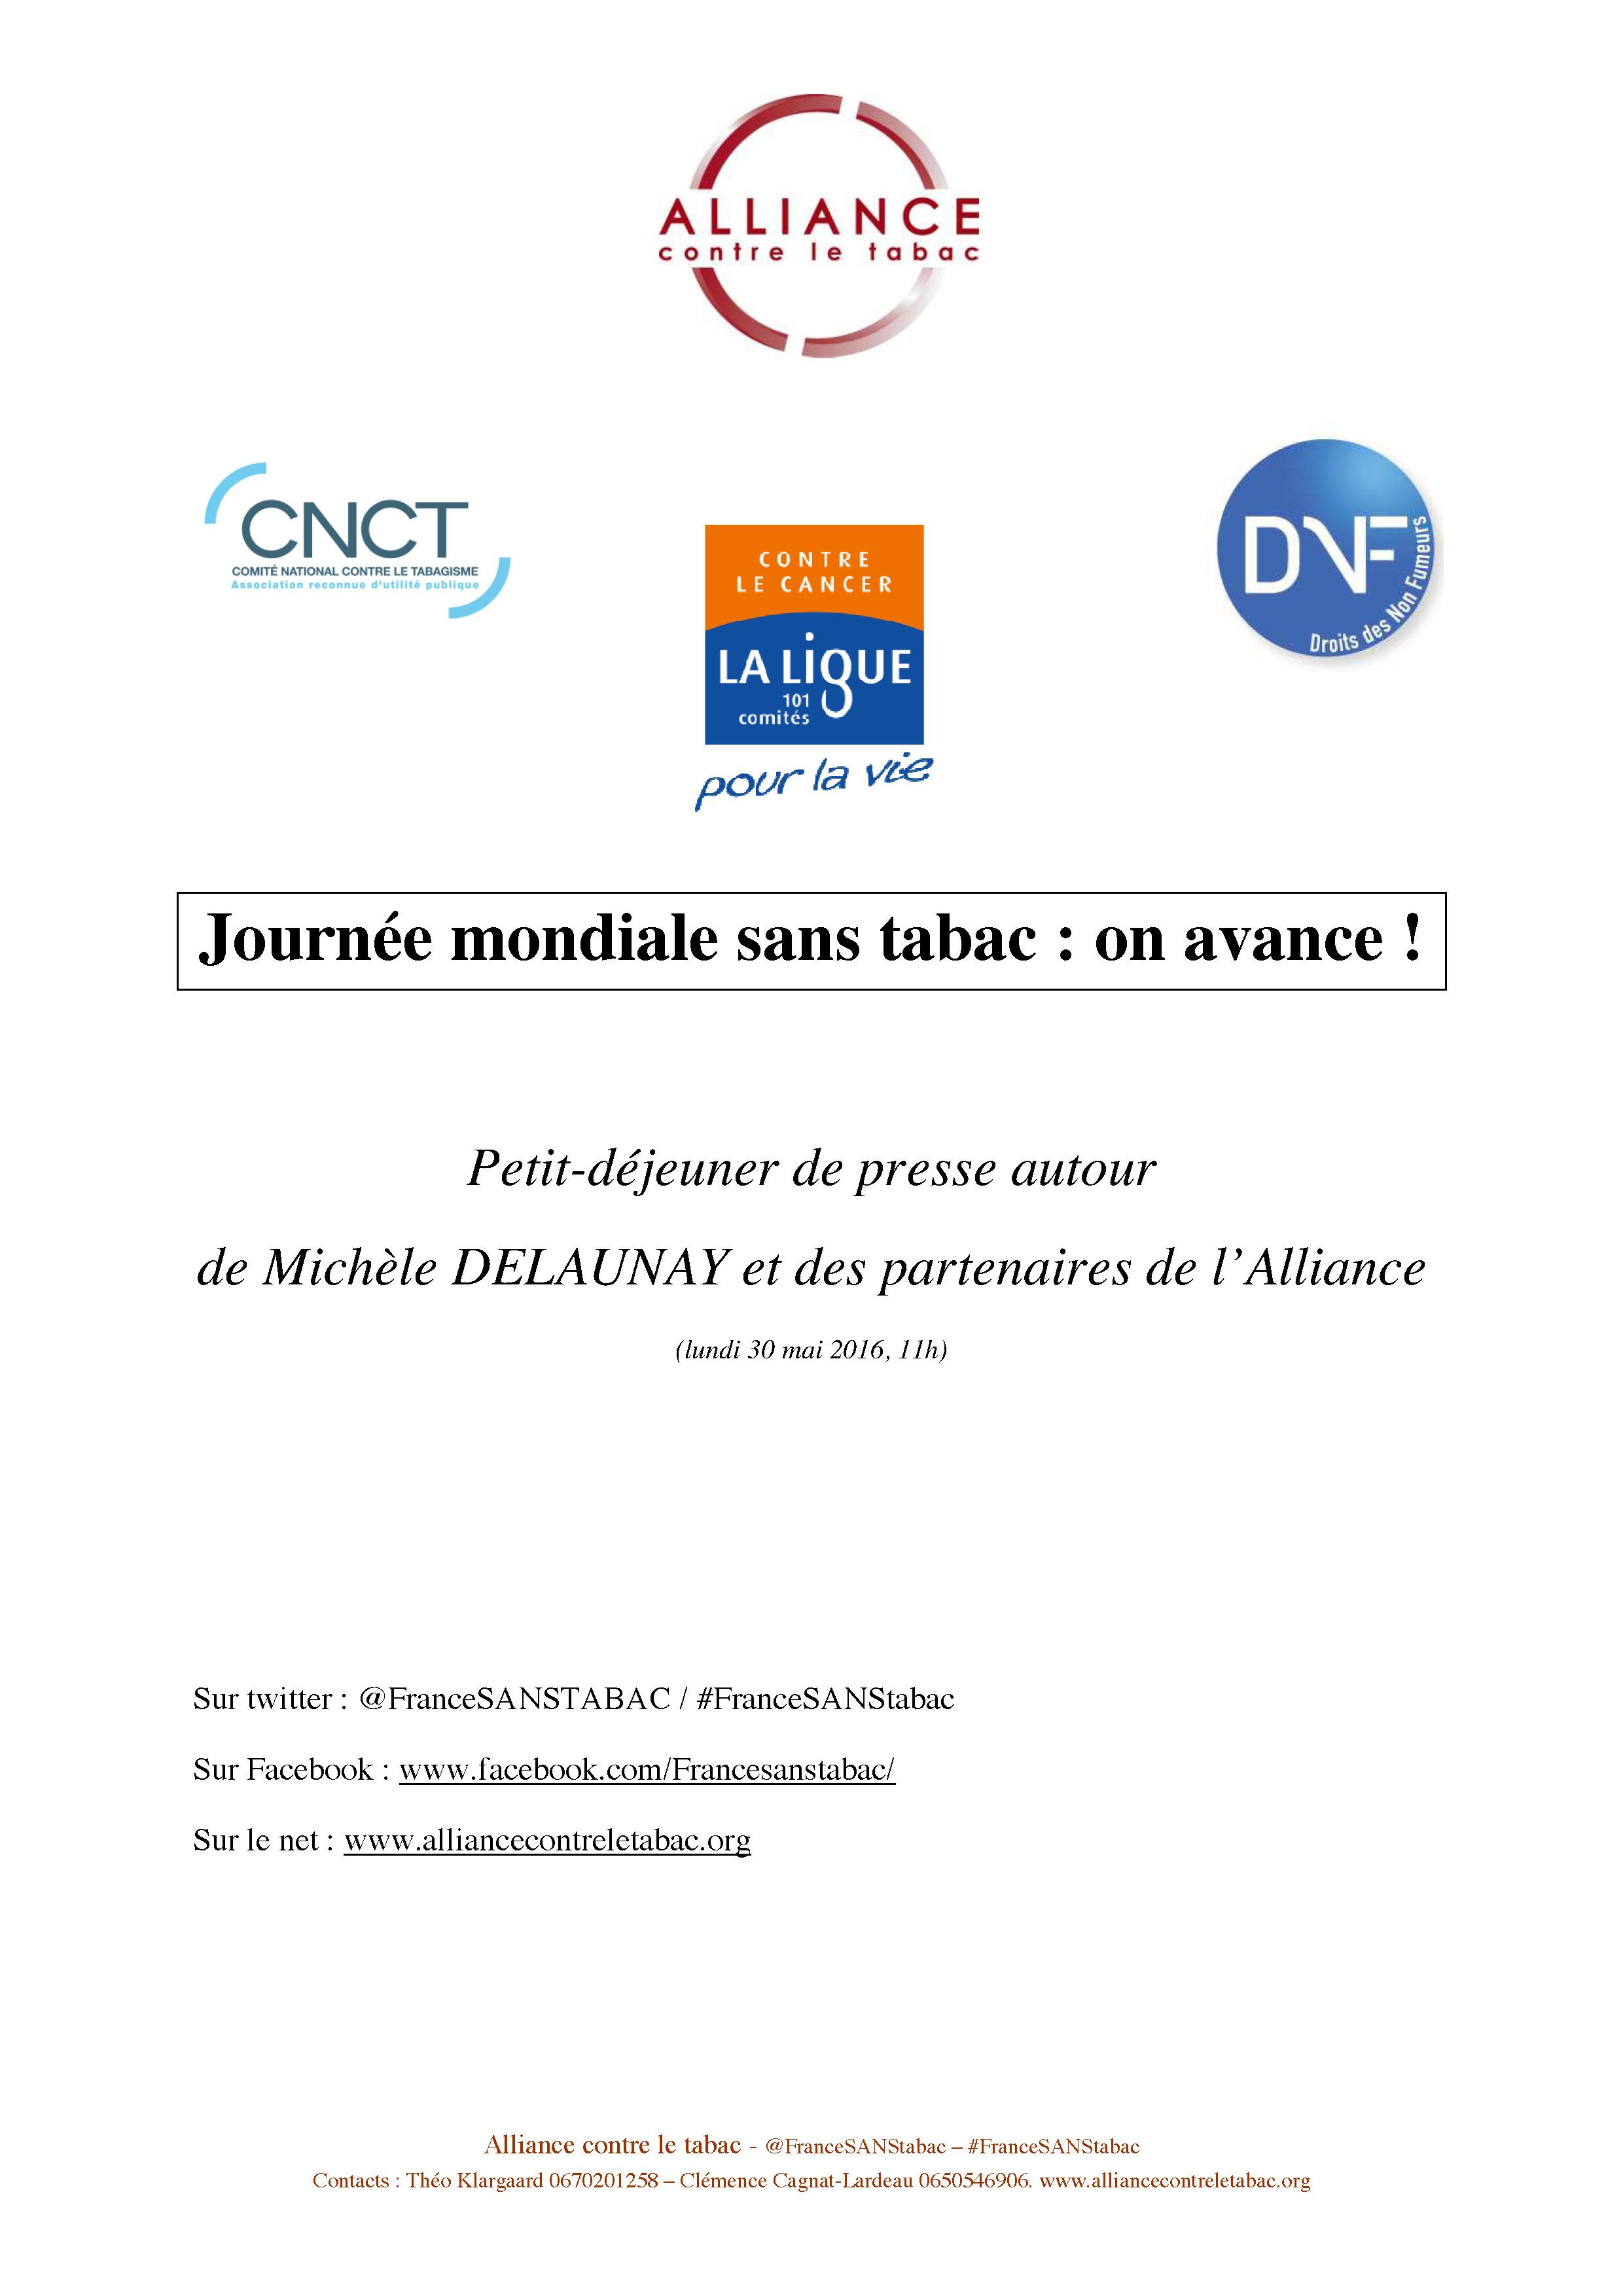 Alliance-DP_journee-mondiale-sans-tabac-avec-annexes-vf-30mai2016_Page_01.jpg